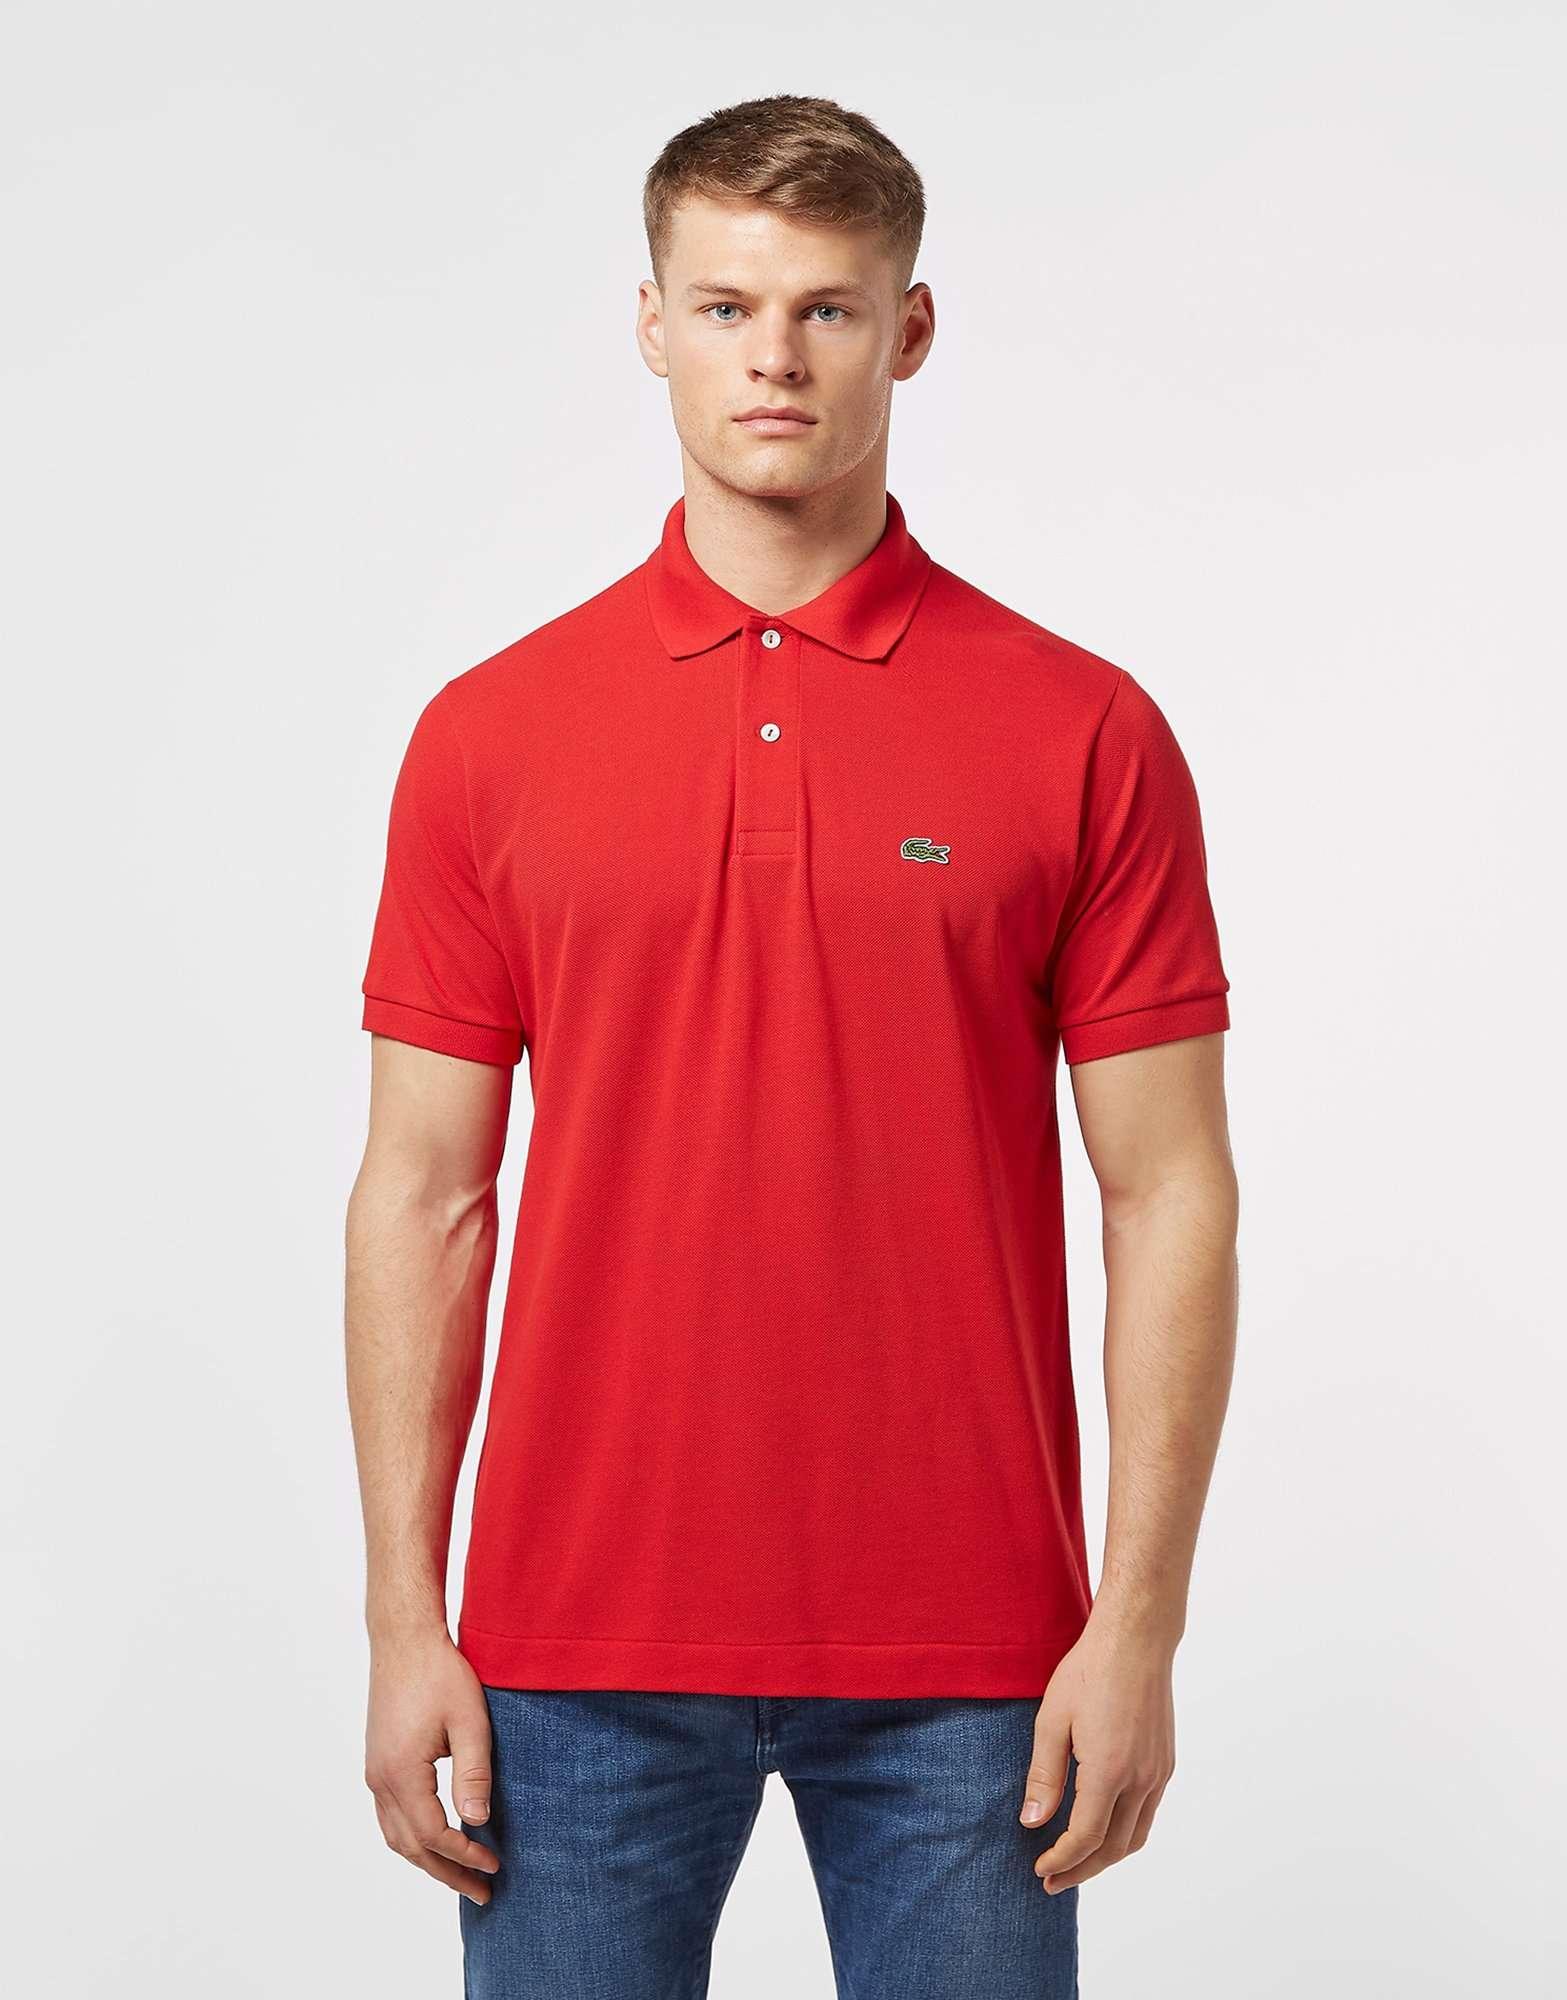 lacoste l1212 sleeve polo shirt scotts menswear